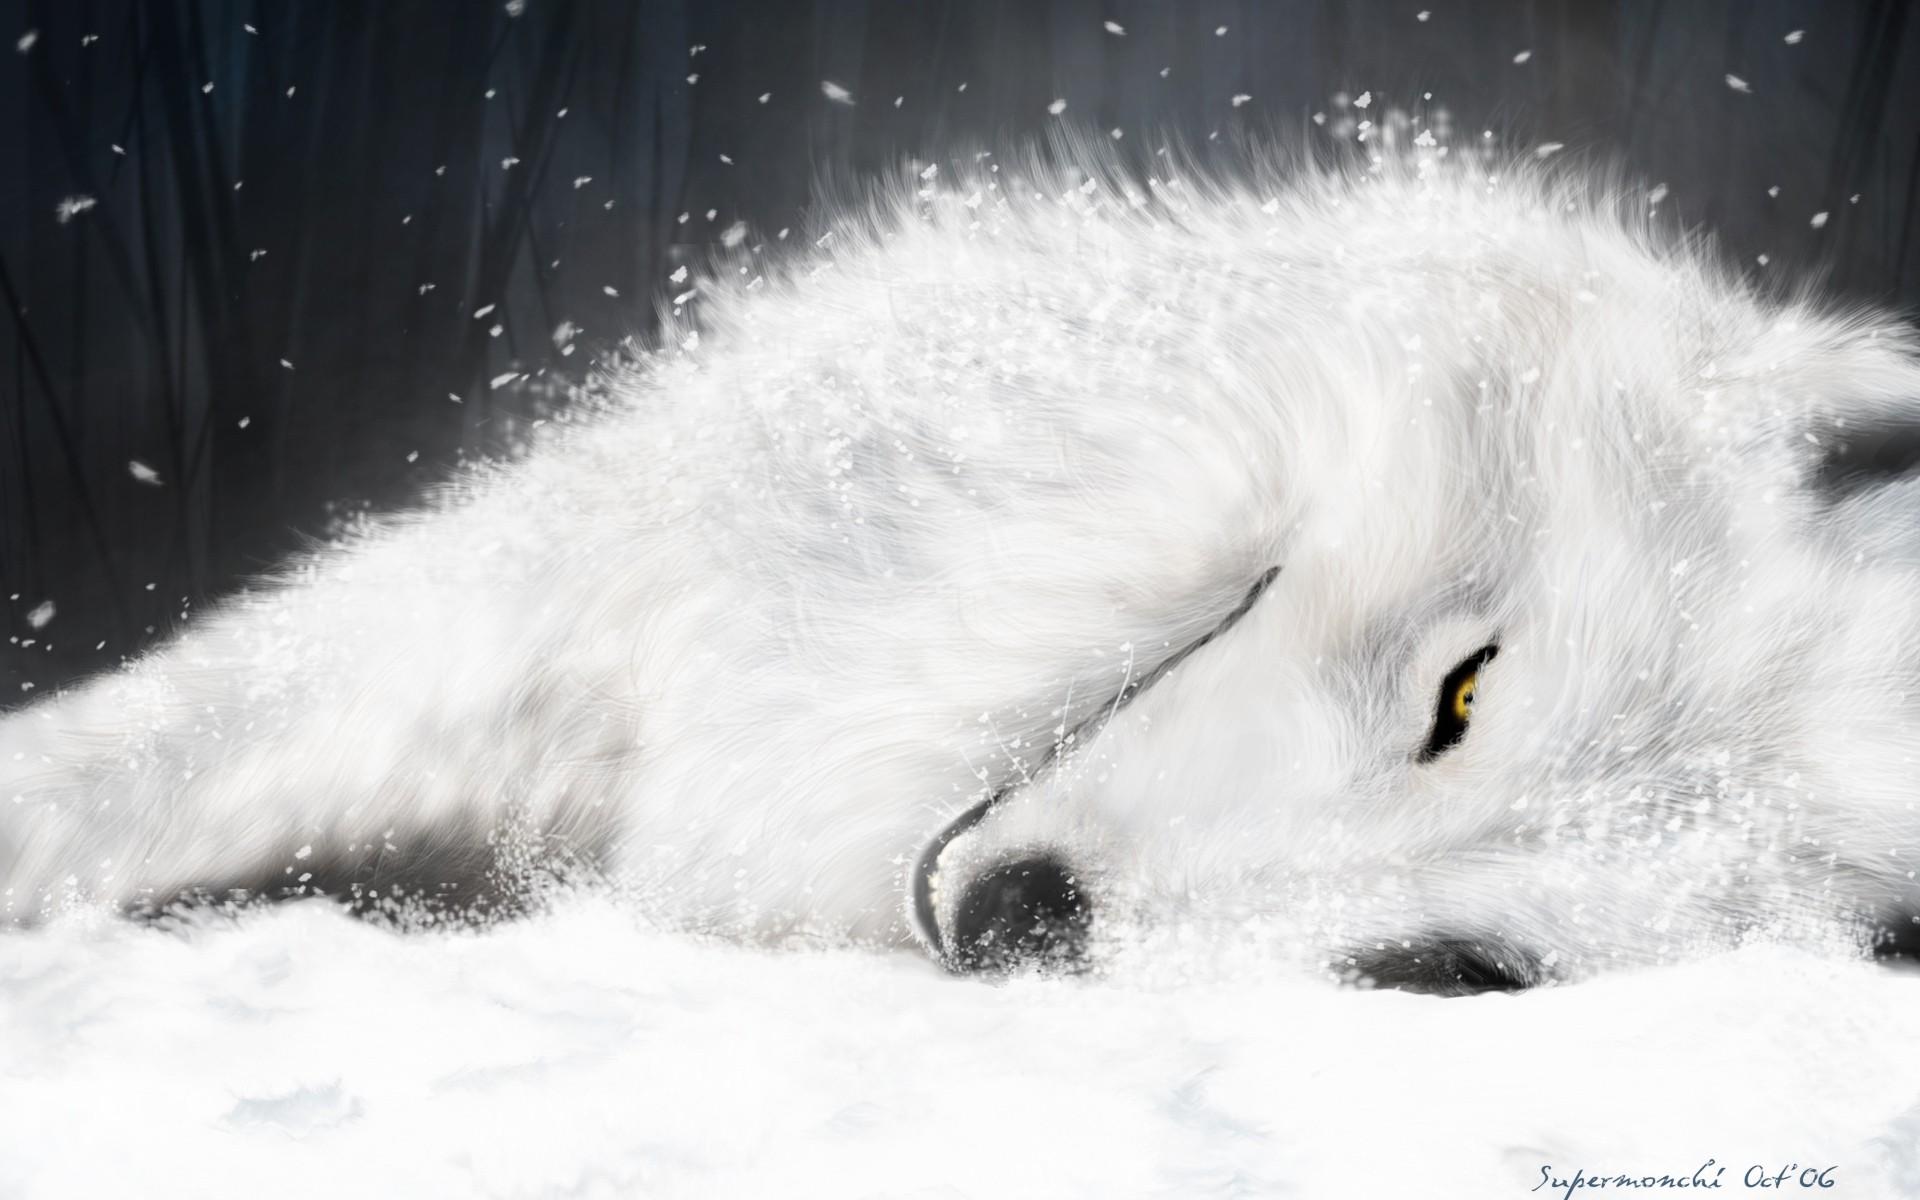 kiba_wolf_s_rain_full_51151.jpg